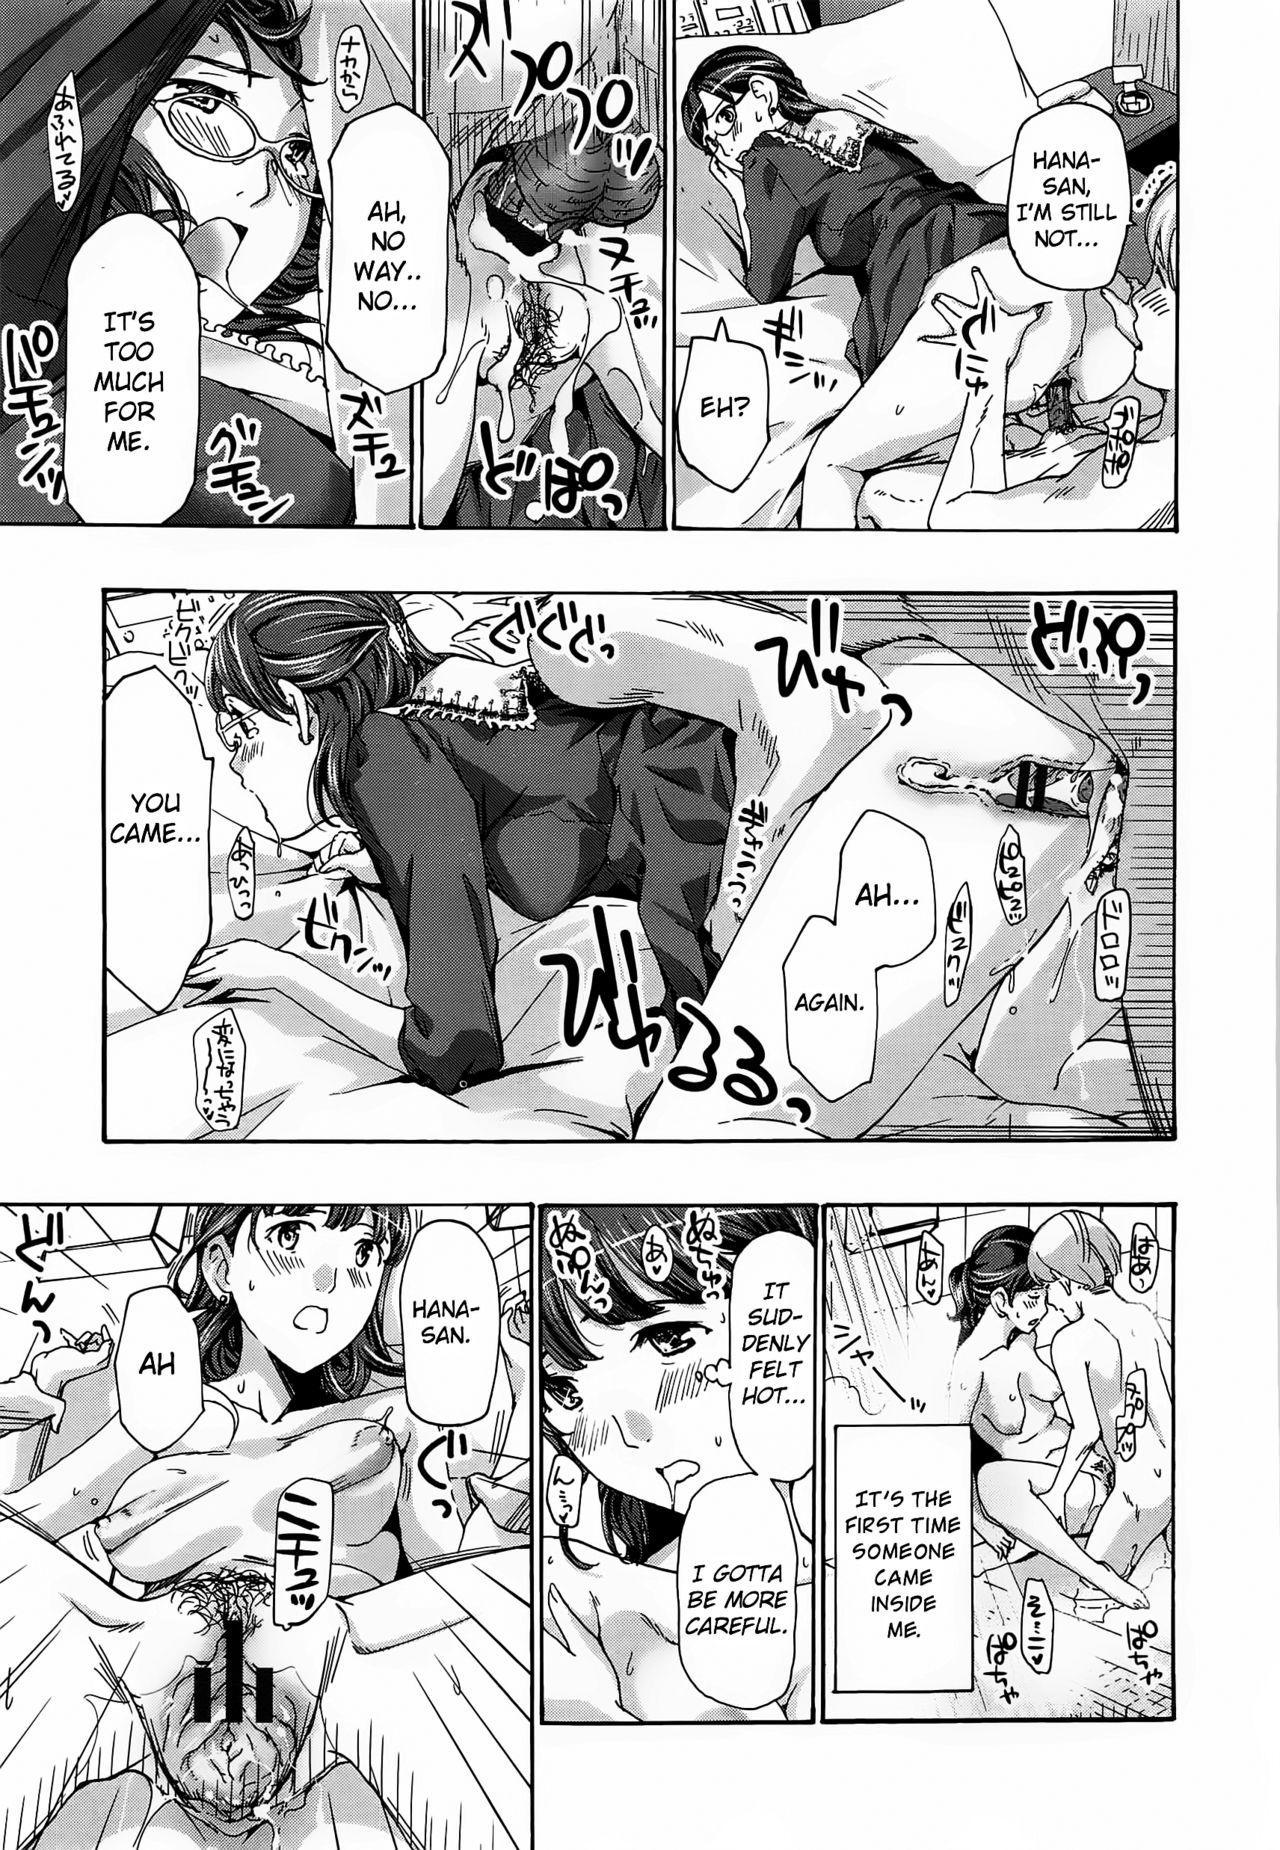 Hana-san no Asagaeri 14